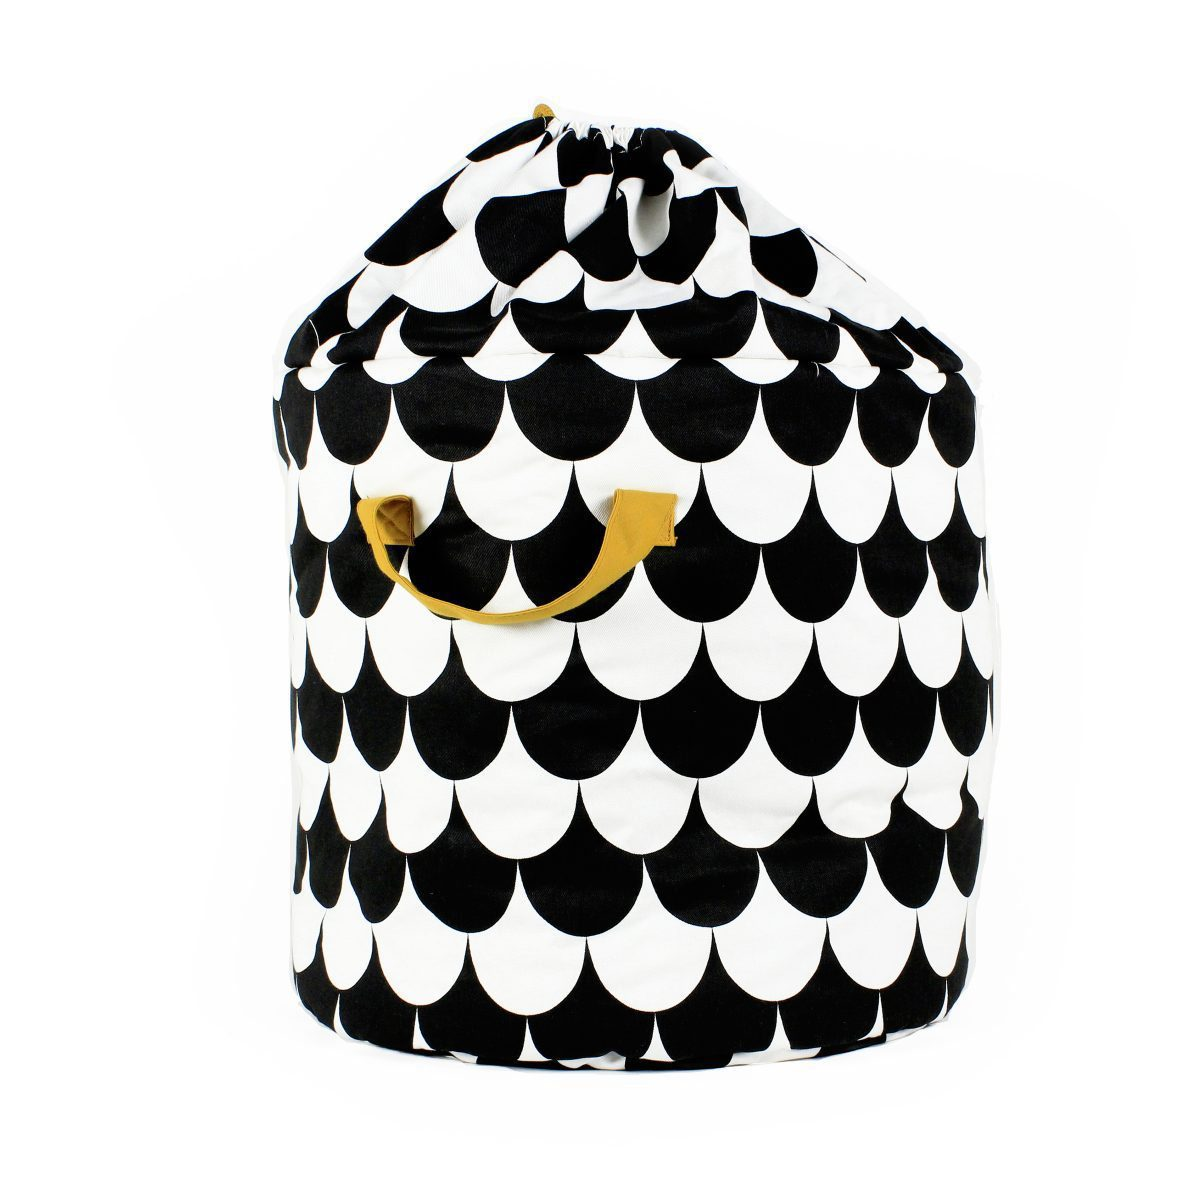 Nobodinoz Baobab toy bag scales in black